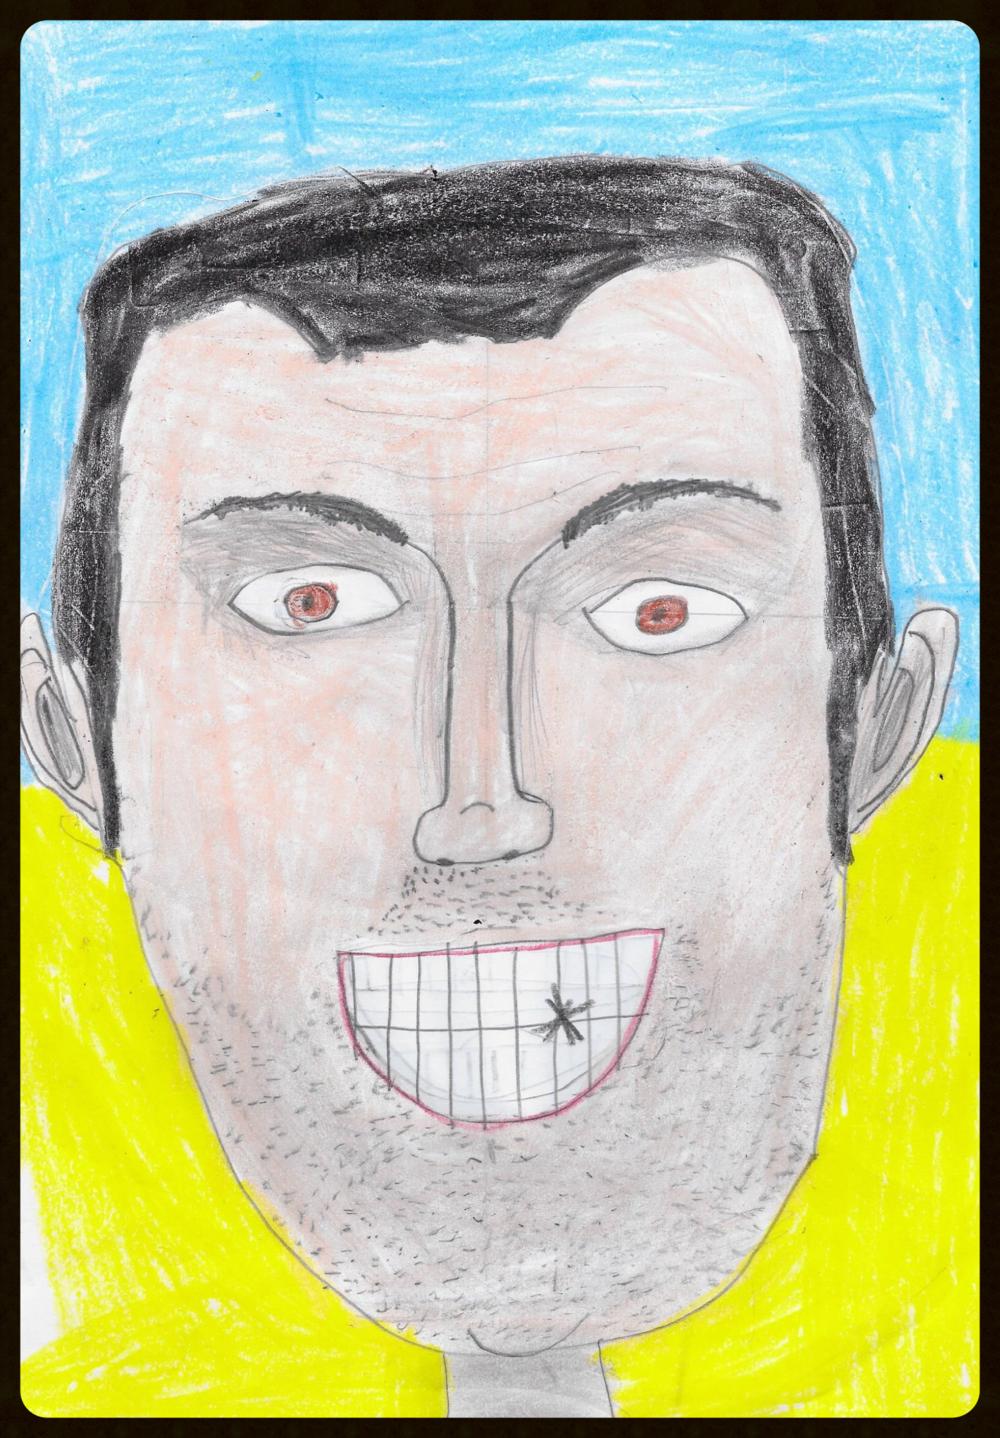 Mr. E Byrne   - 6th Class Teacher